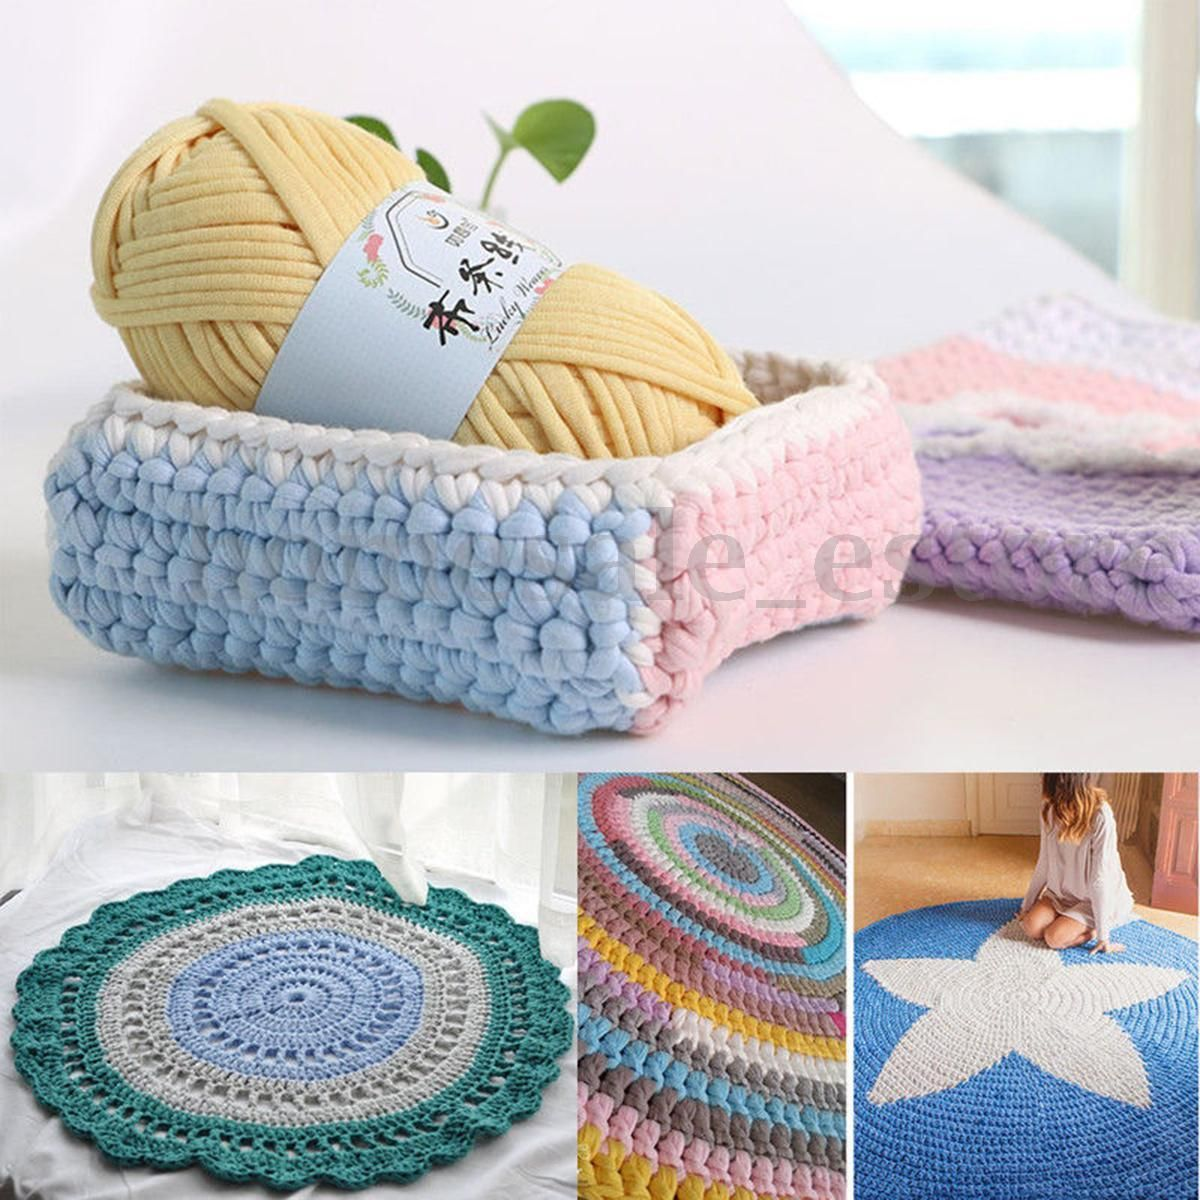 100g Soft Fabric Yarn DIY Rug Carpets Basket Blanket Crochet Yarn Hand Knitting